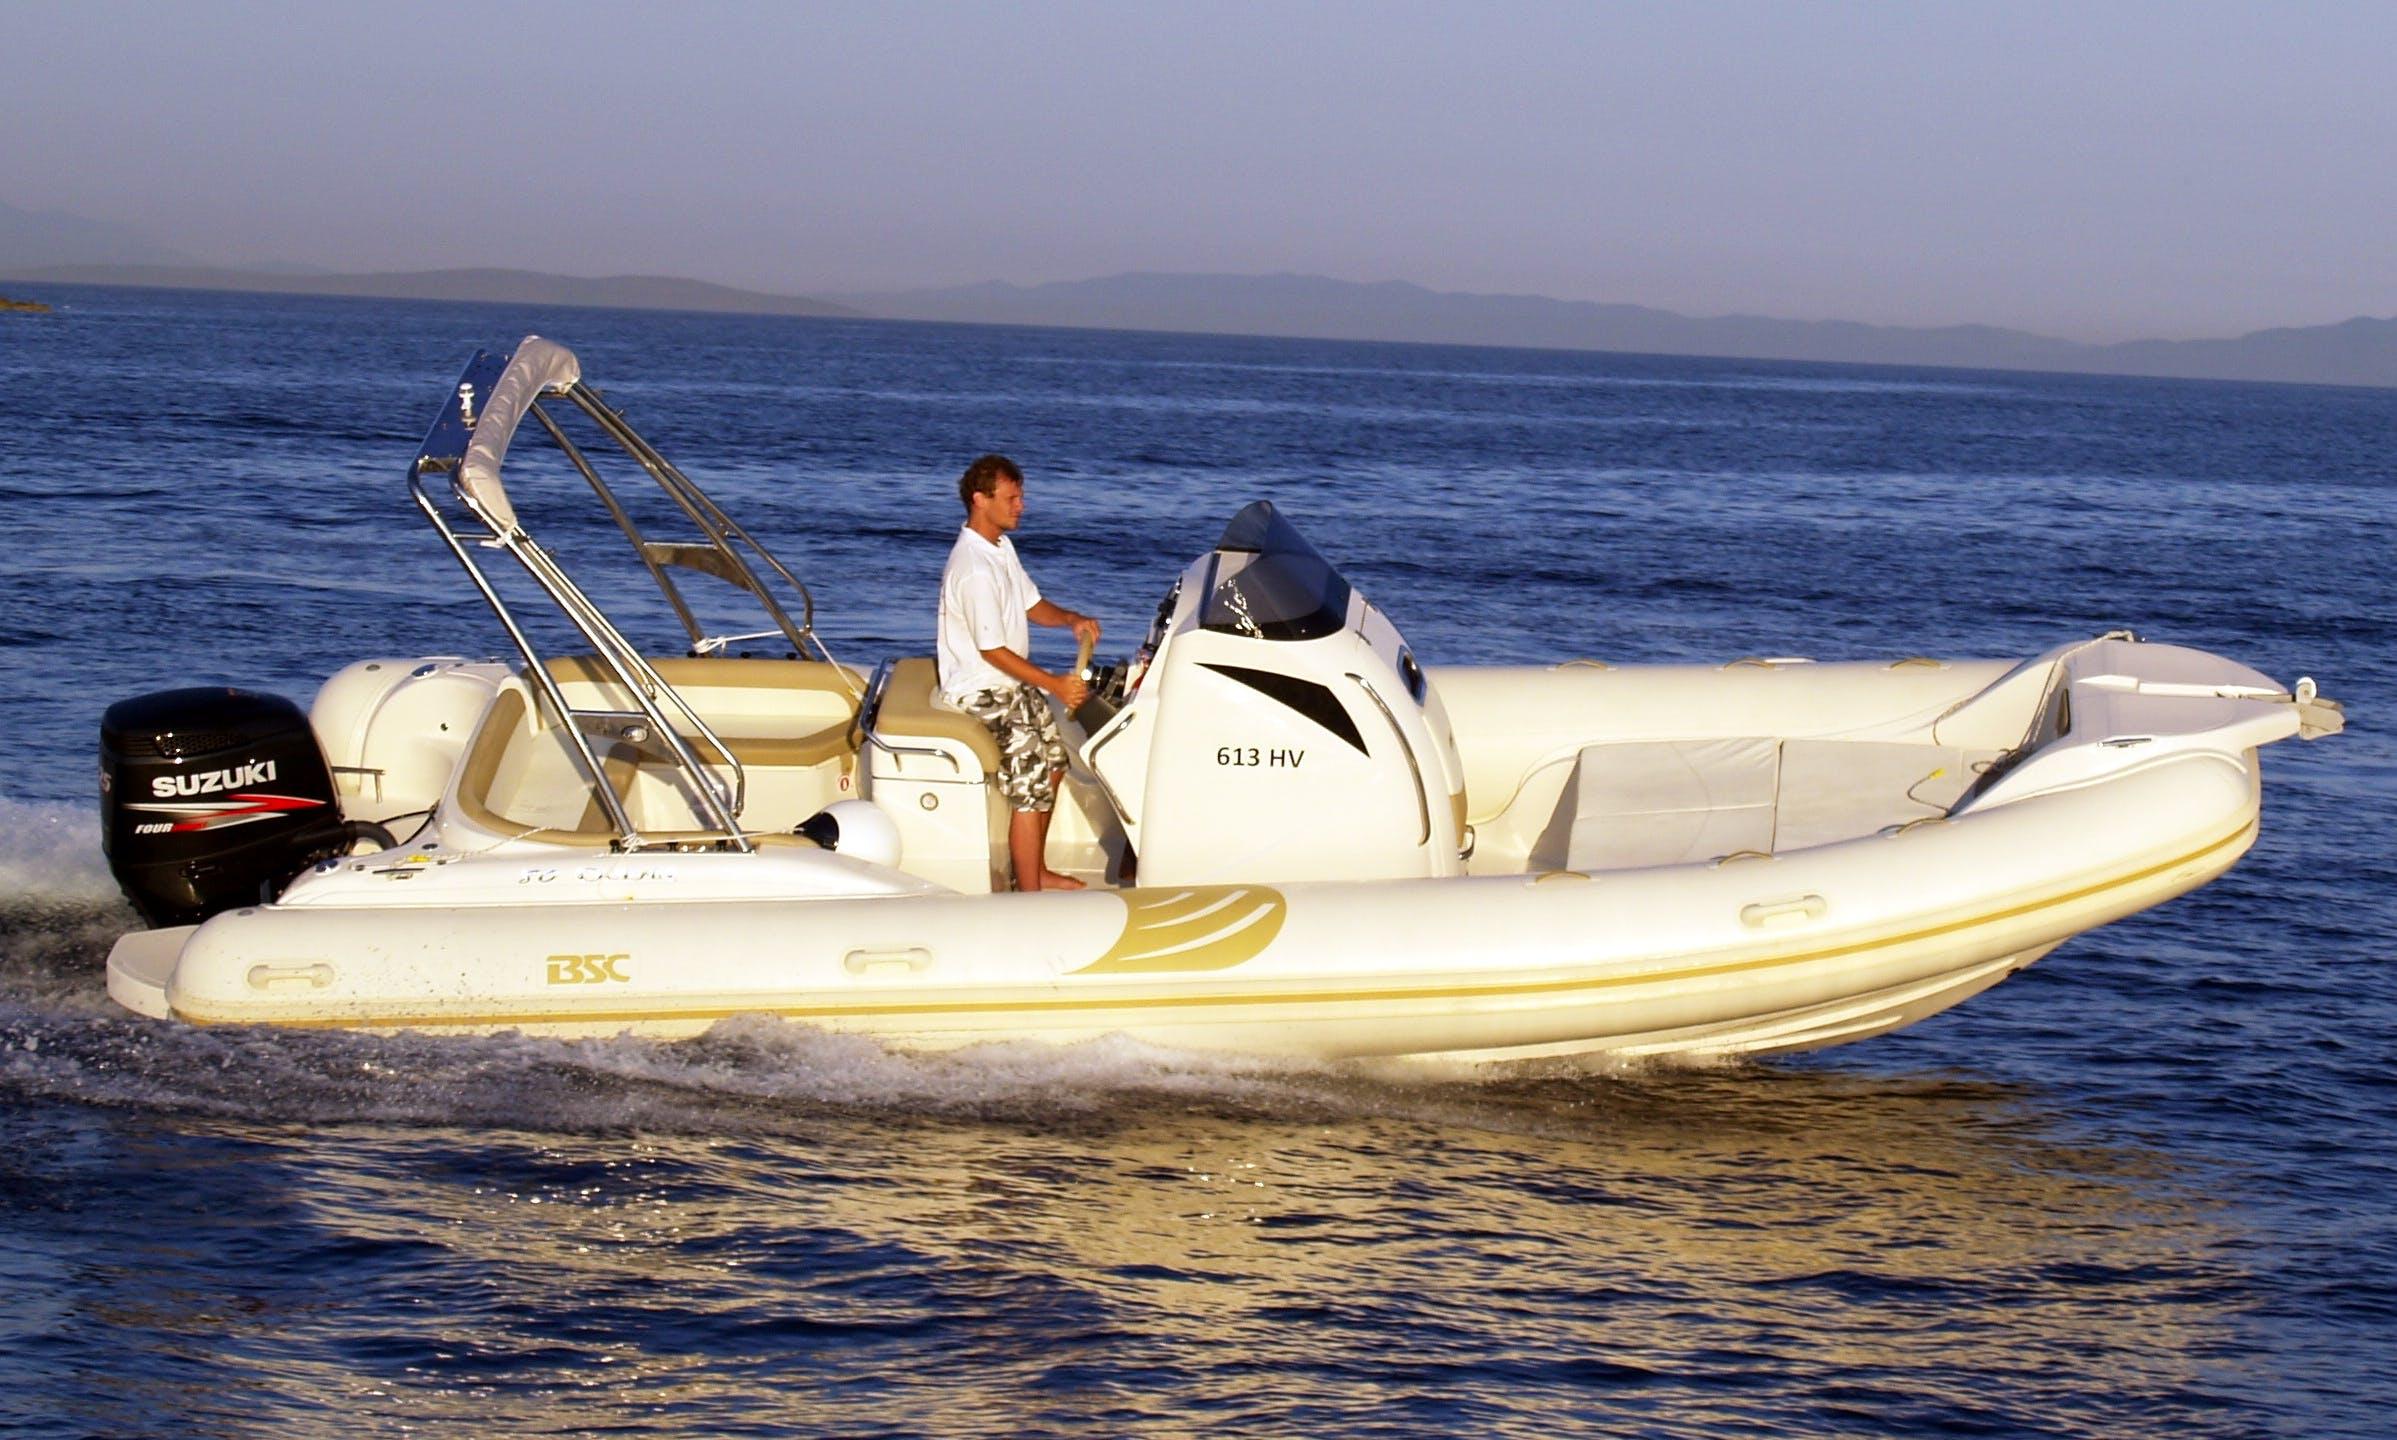 BSC 80 Ocean RIB Charter in Santanyí